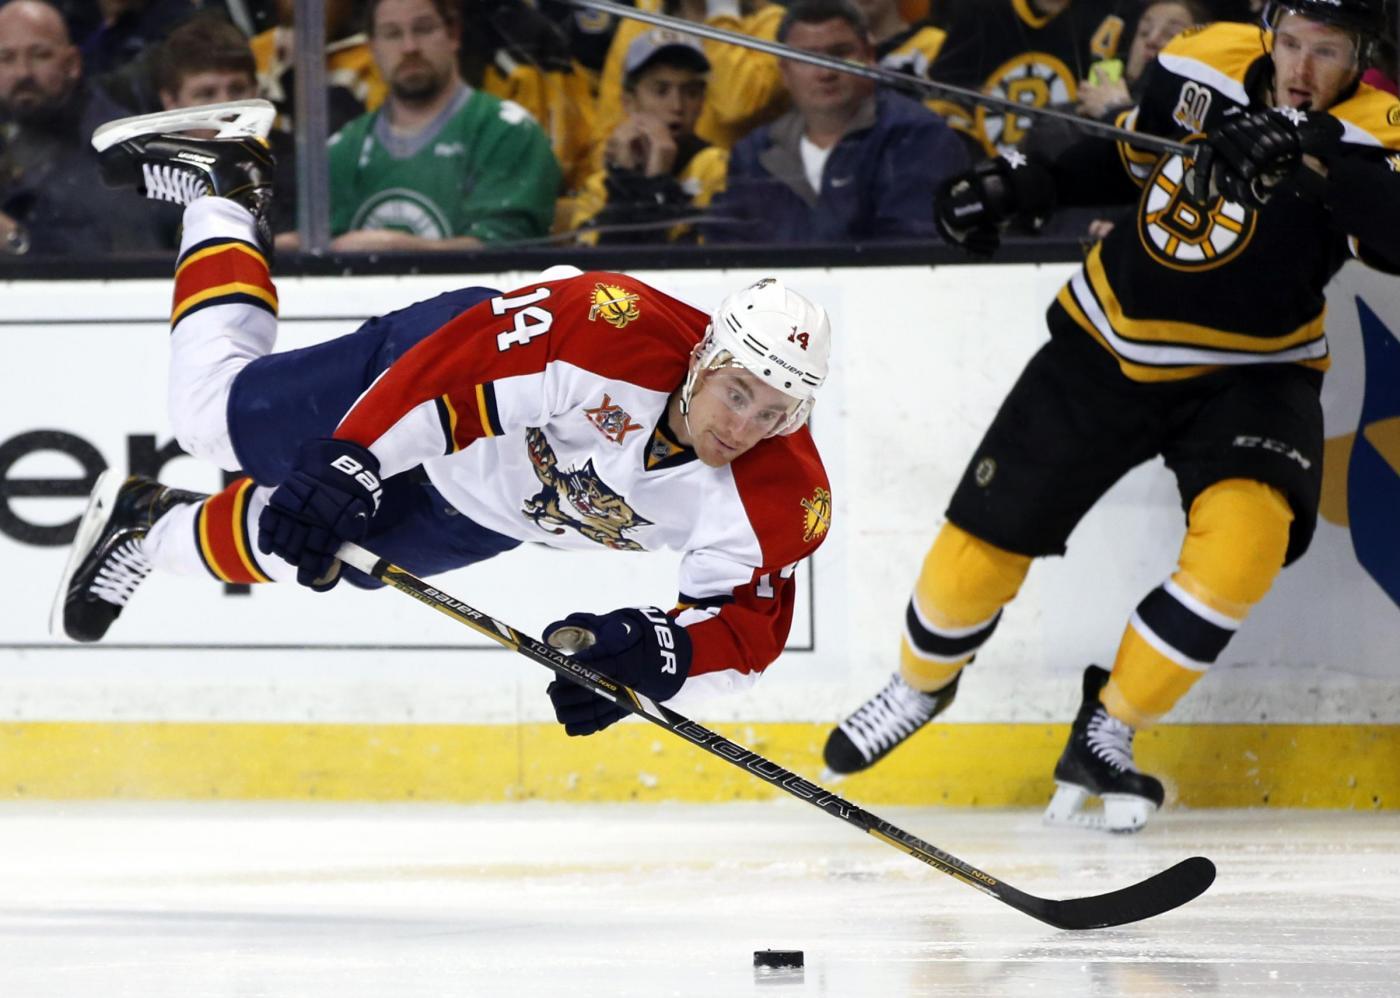 Pronostici NHL 12 dicembre,tre partite, spicca Capital contro Bruins